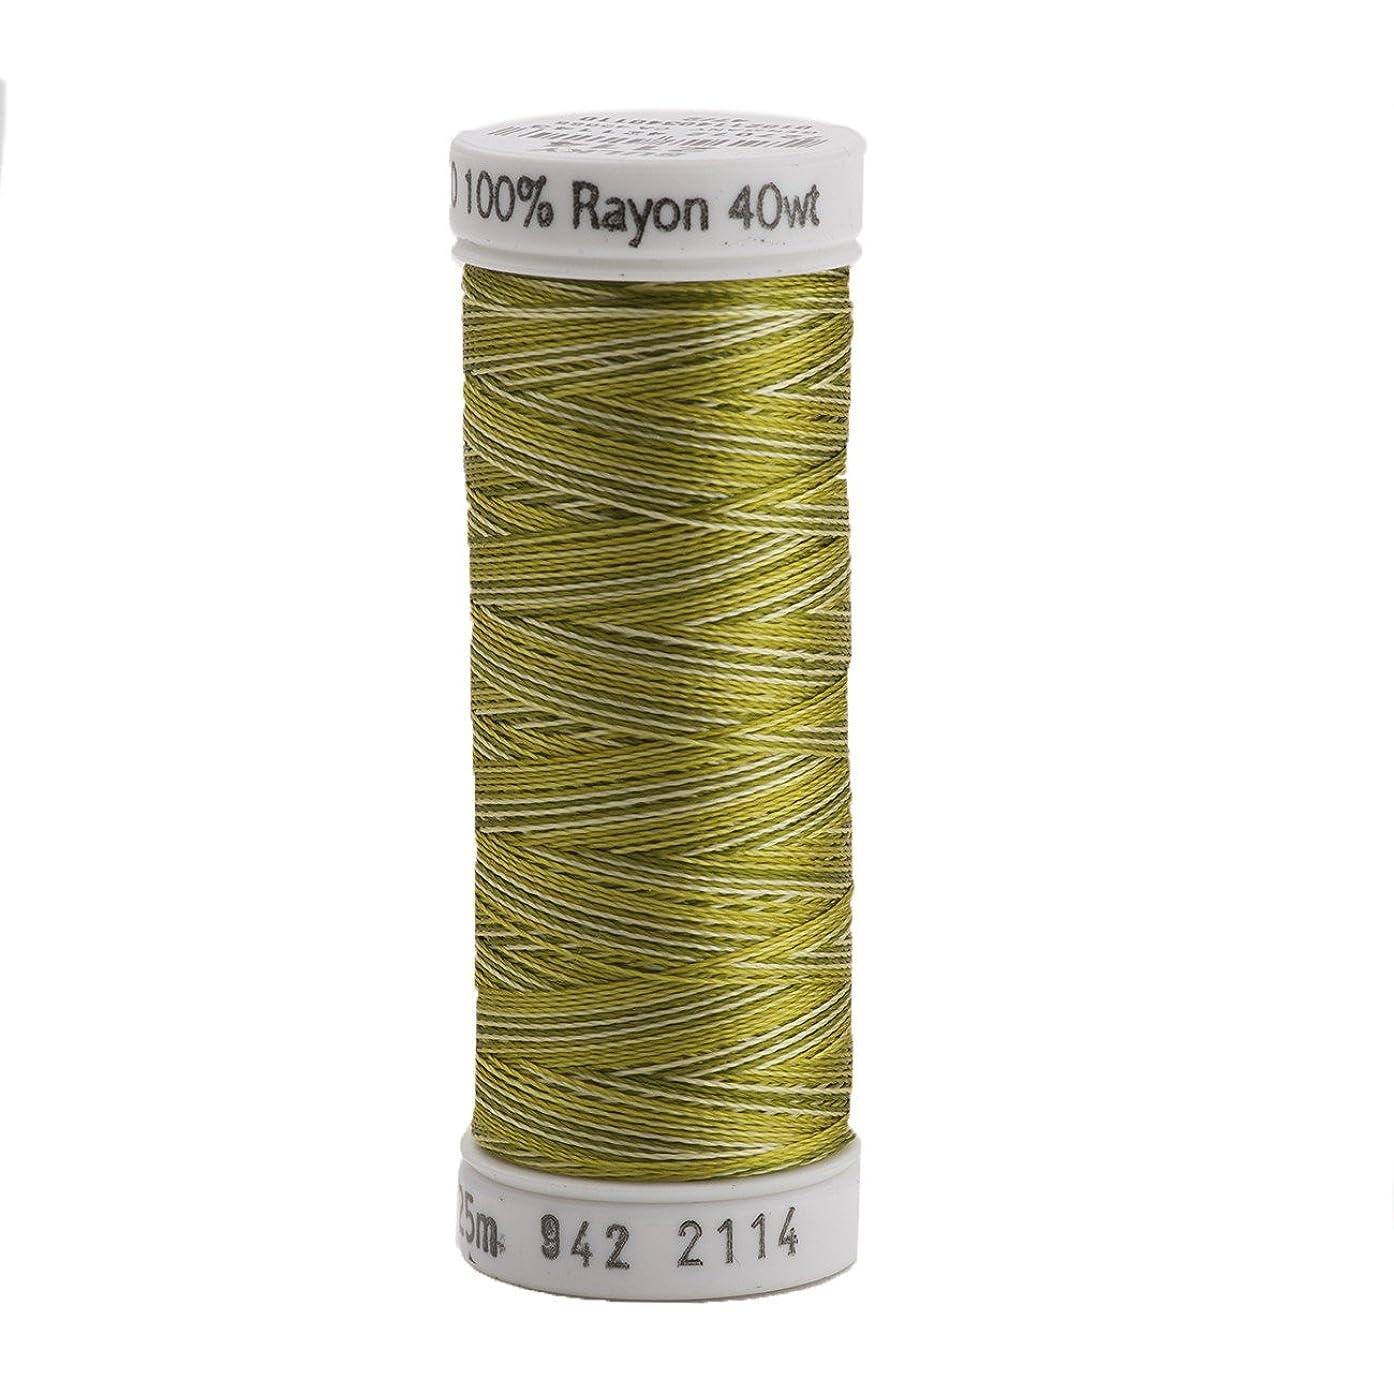 Sulky 942-2114 Rayon Thread for Sewing, 250-Yard, Vari Avocado